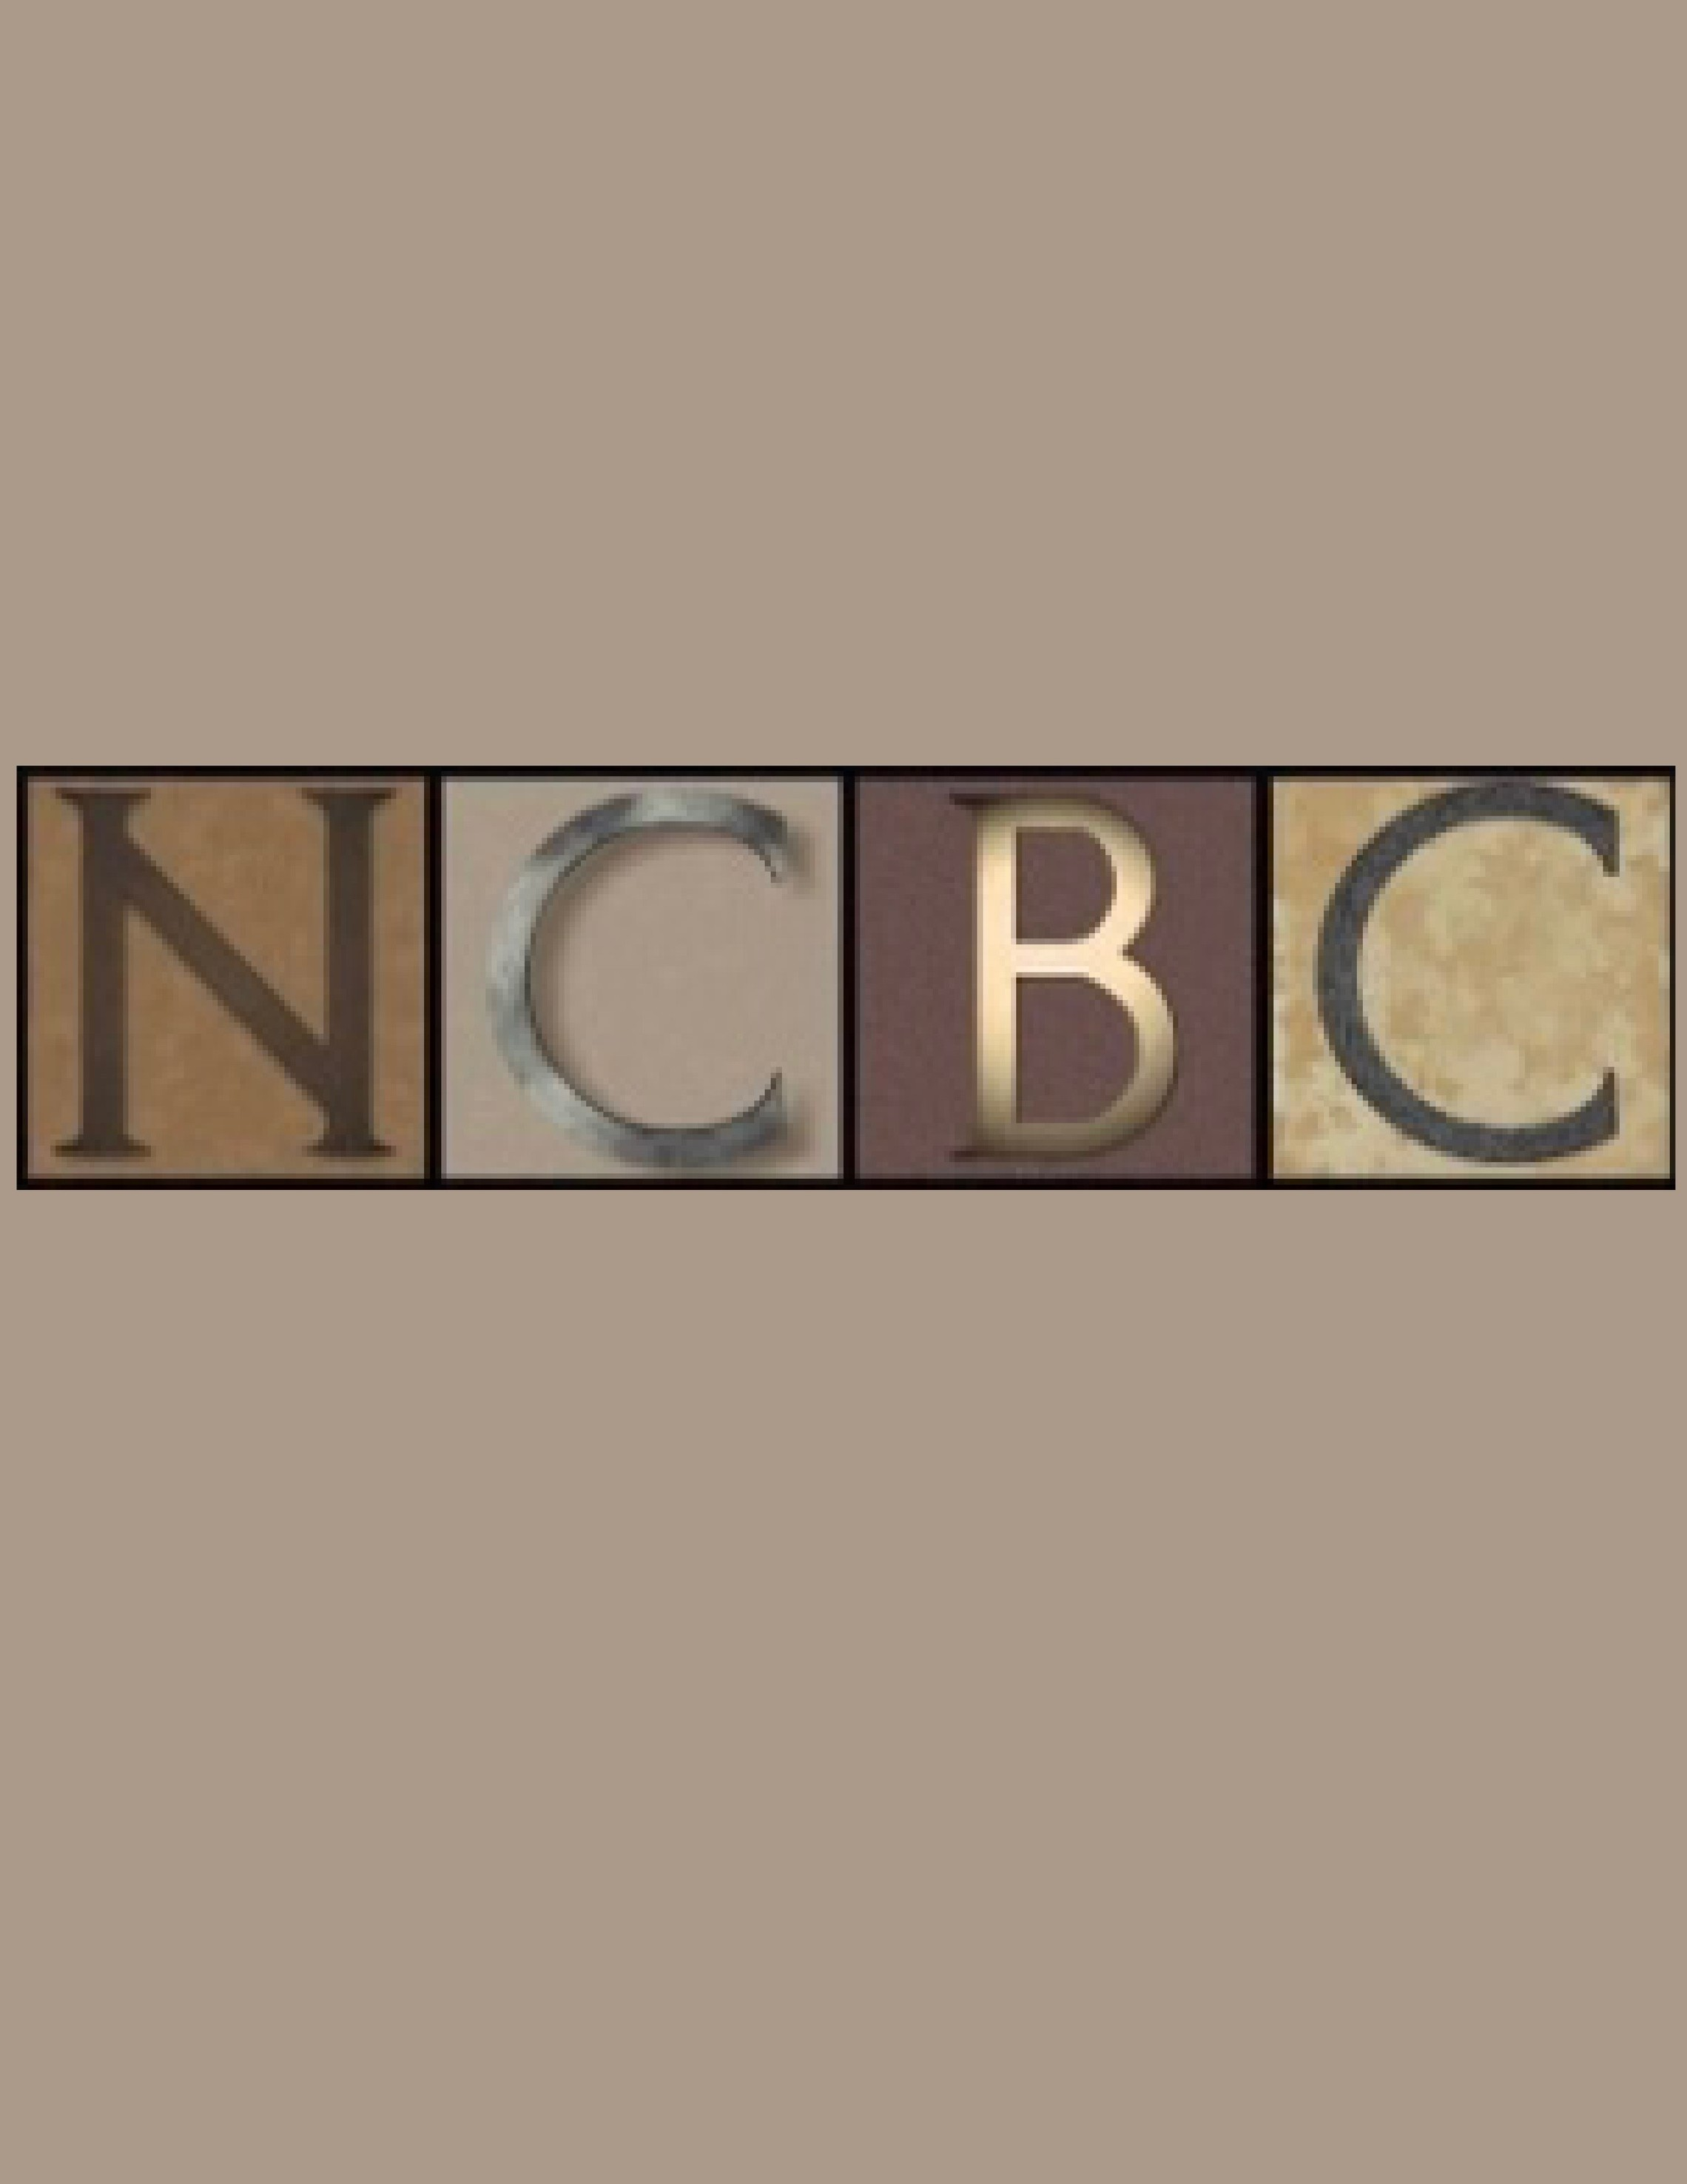 NCBC flyer